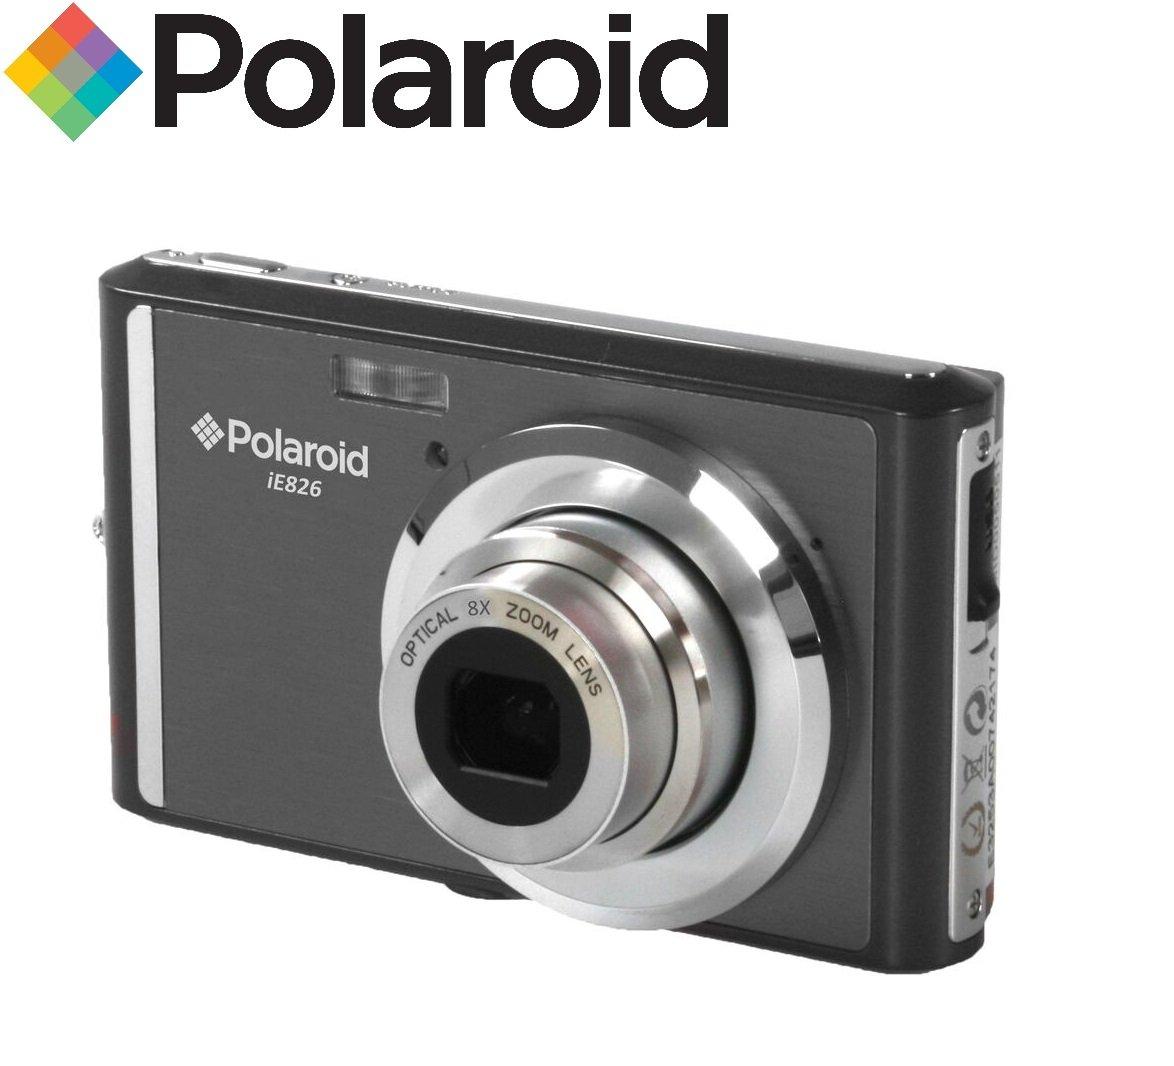 ultra compact digital camera 18 megapixel polaroid amazon co uk rh amazon co uk